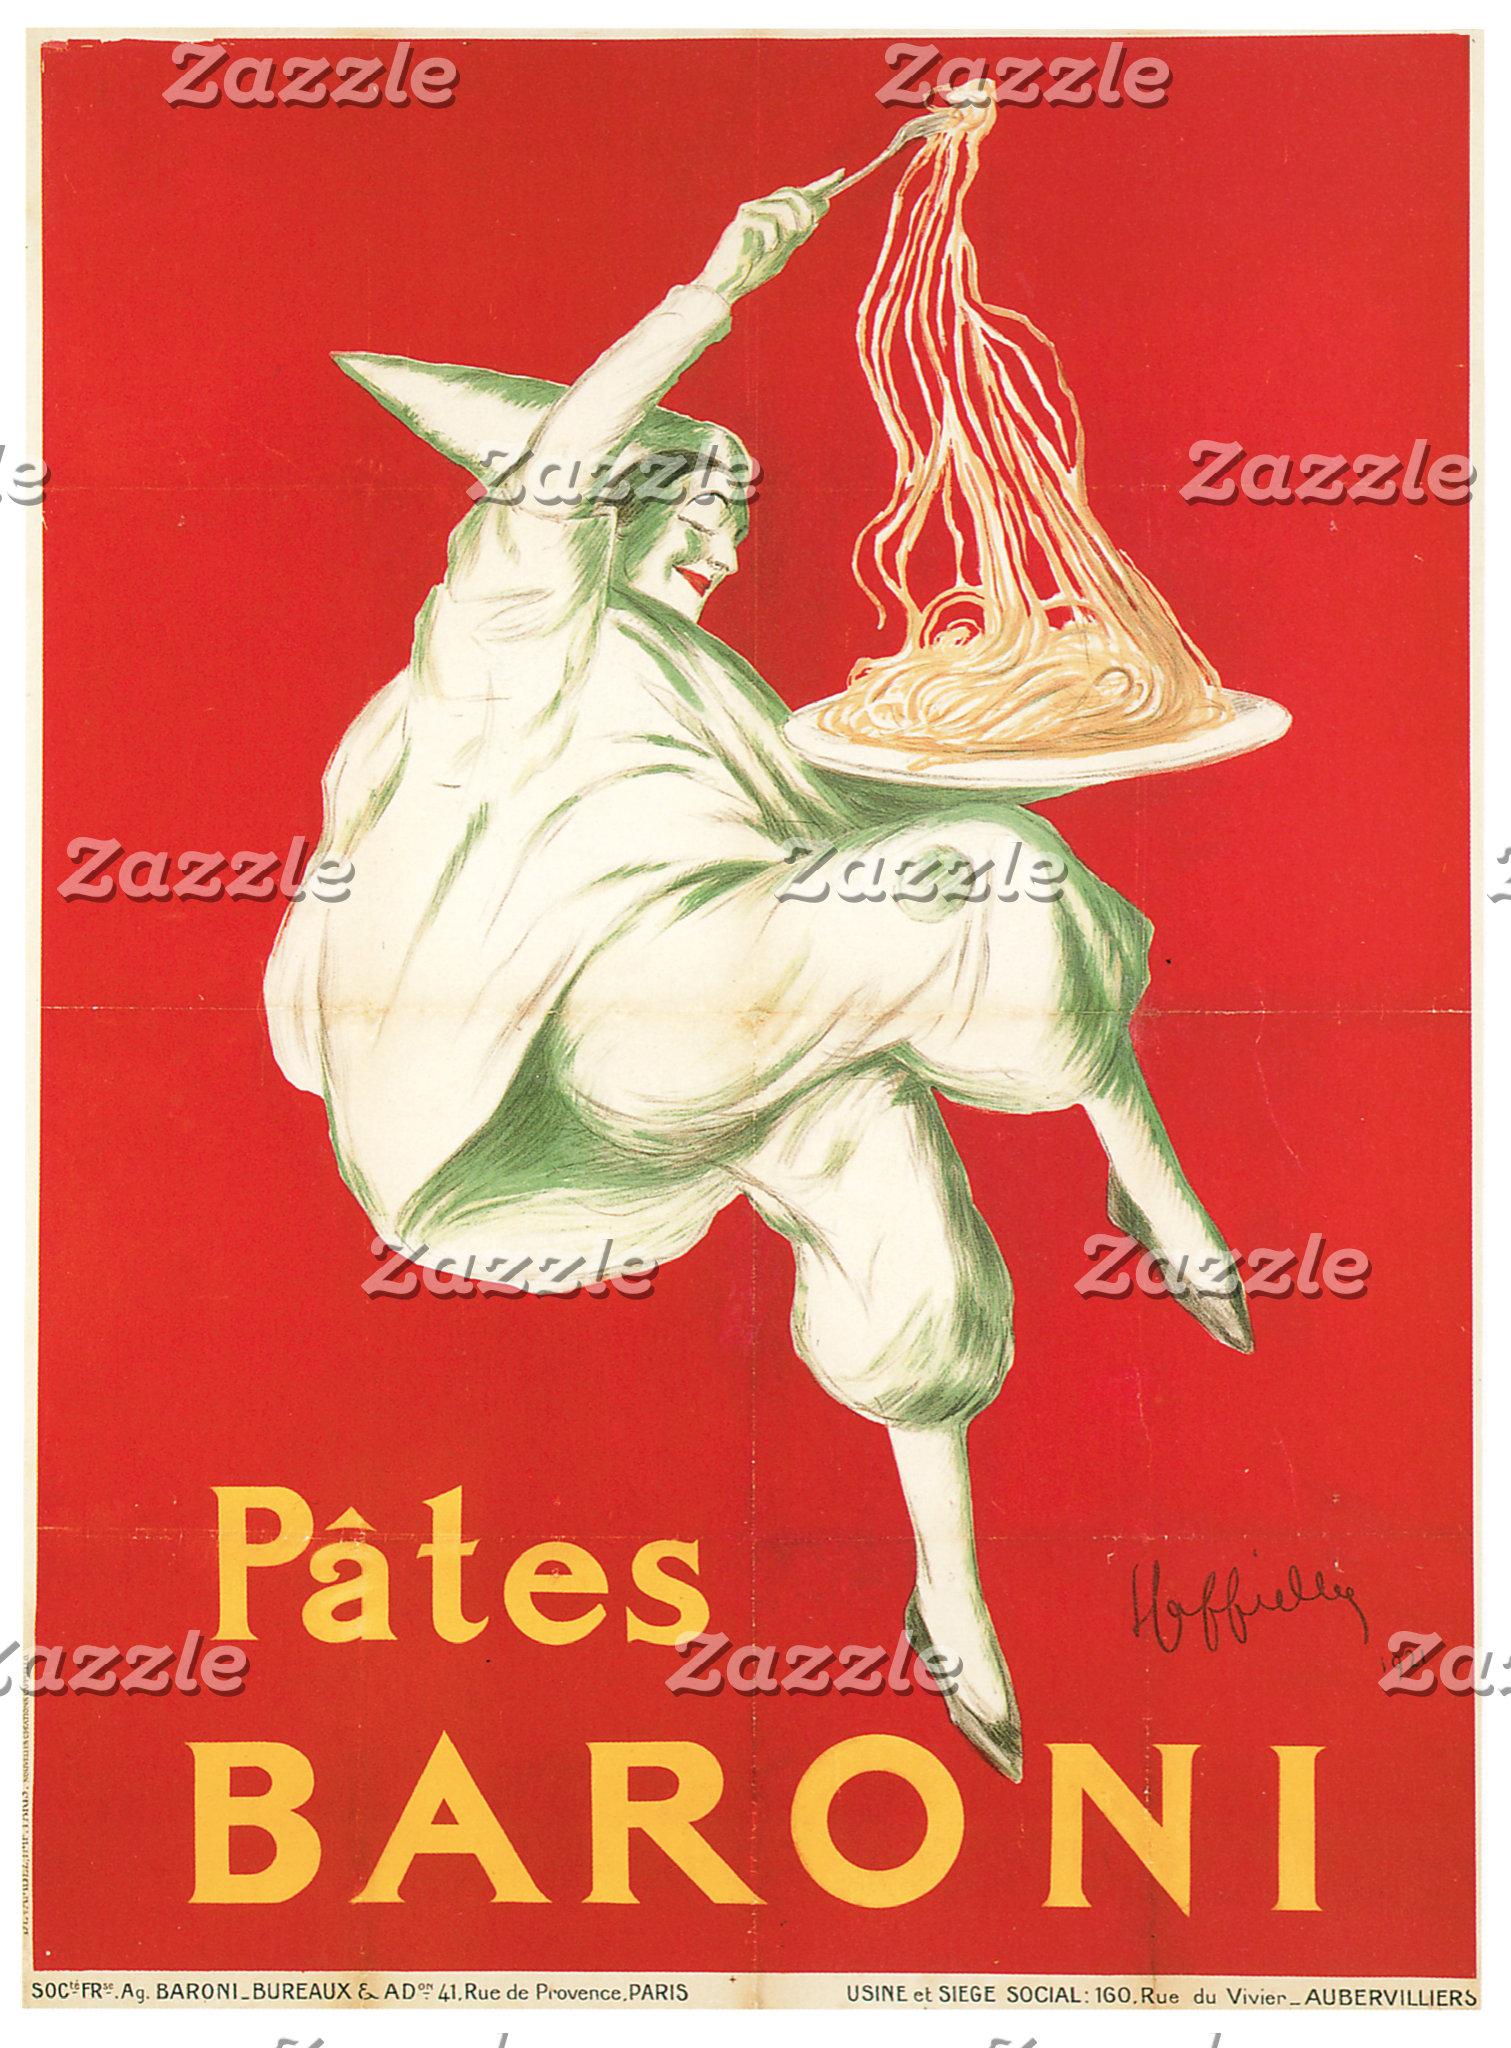 Vintage Food and Drink Ads